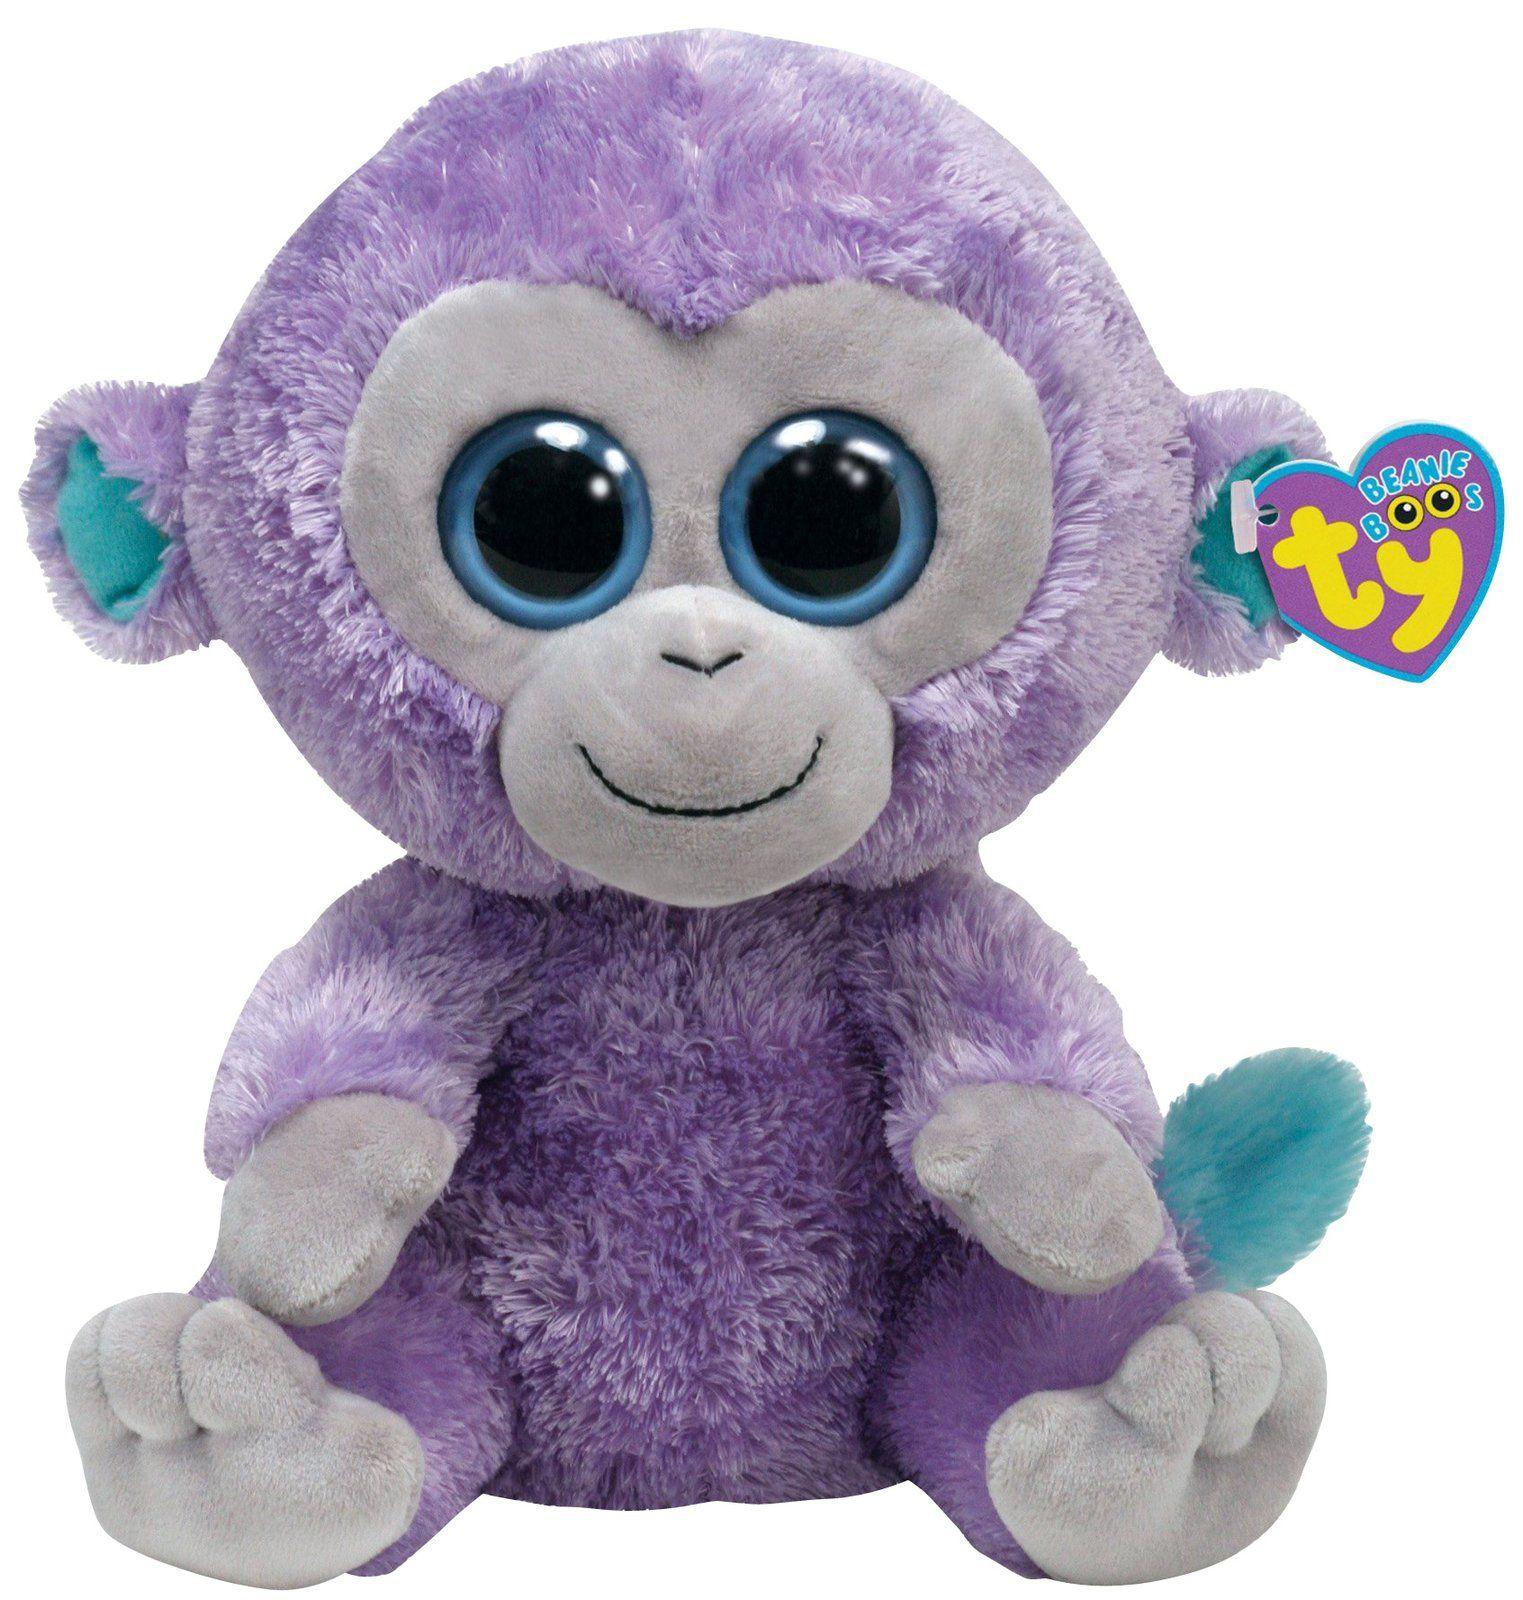 d9d1597b15b Ty Beanie Buddies - Blueberry - Monkey  10  YoYoBirthday